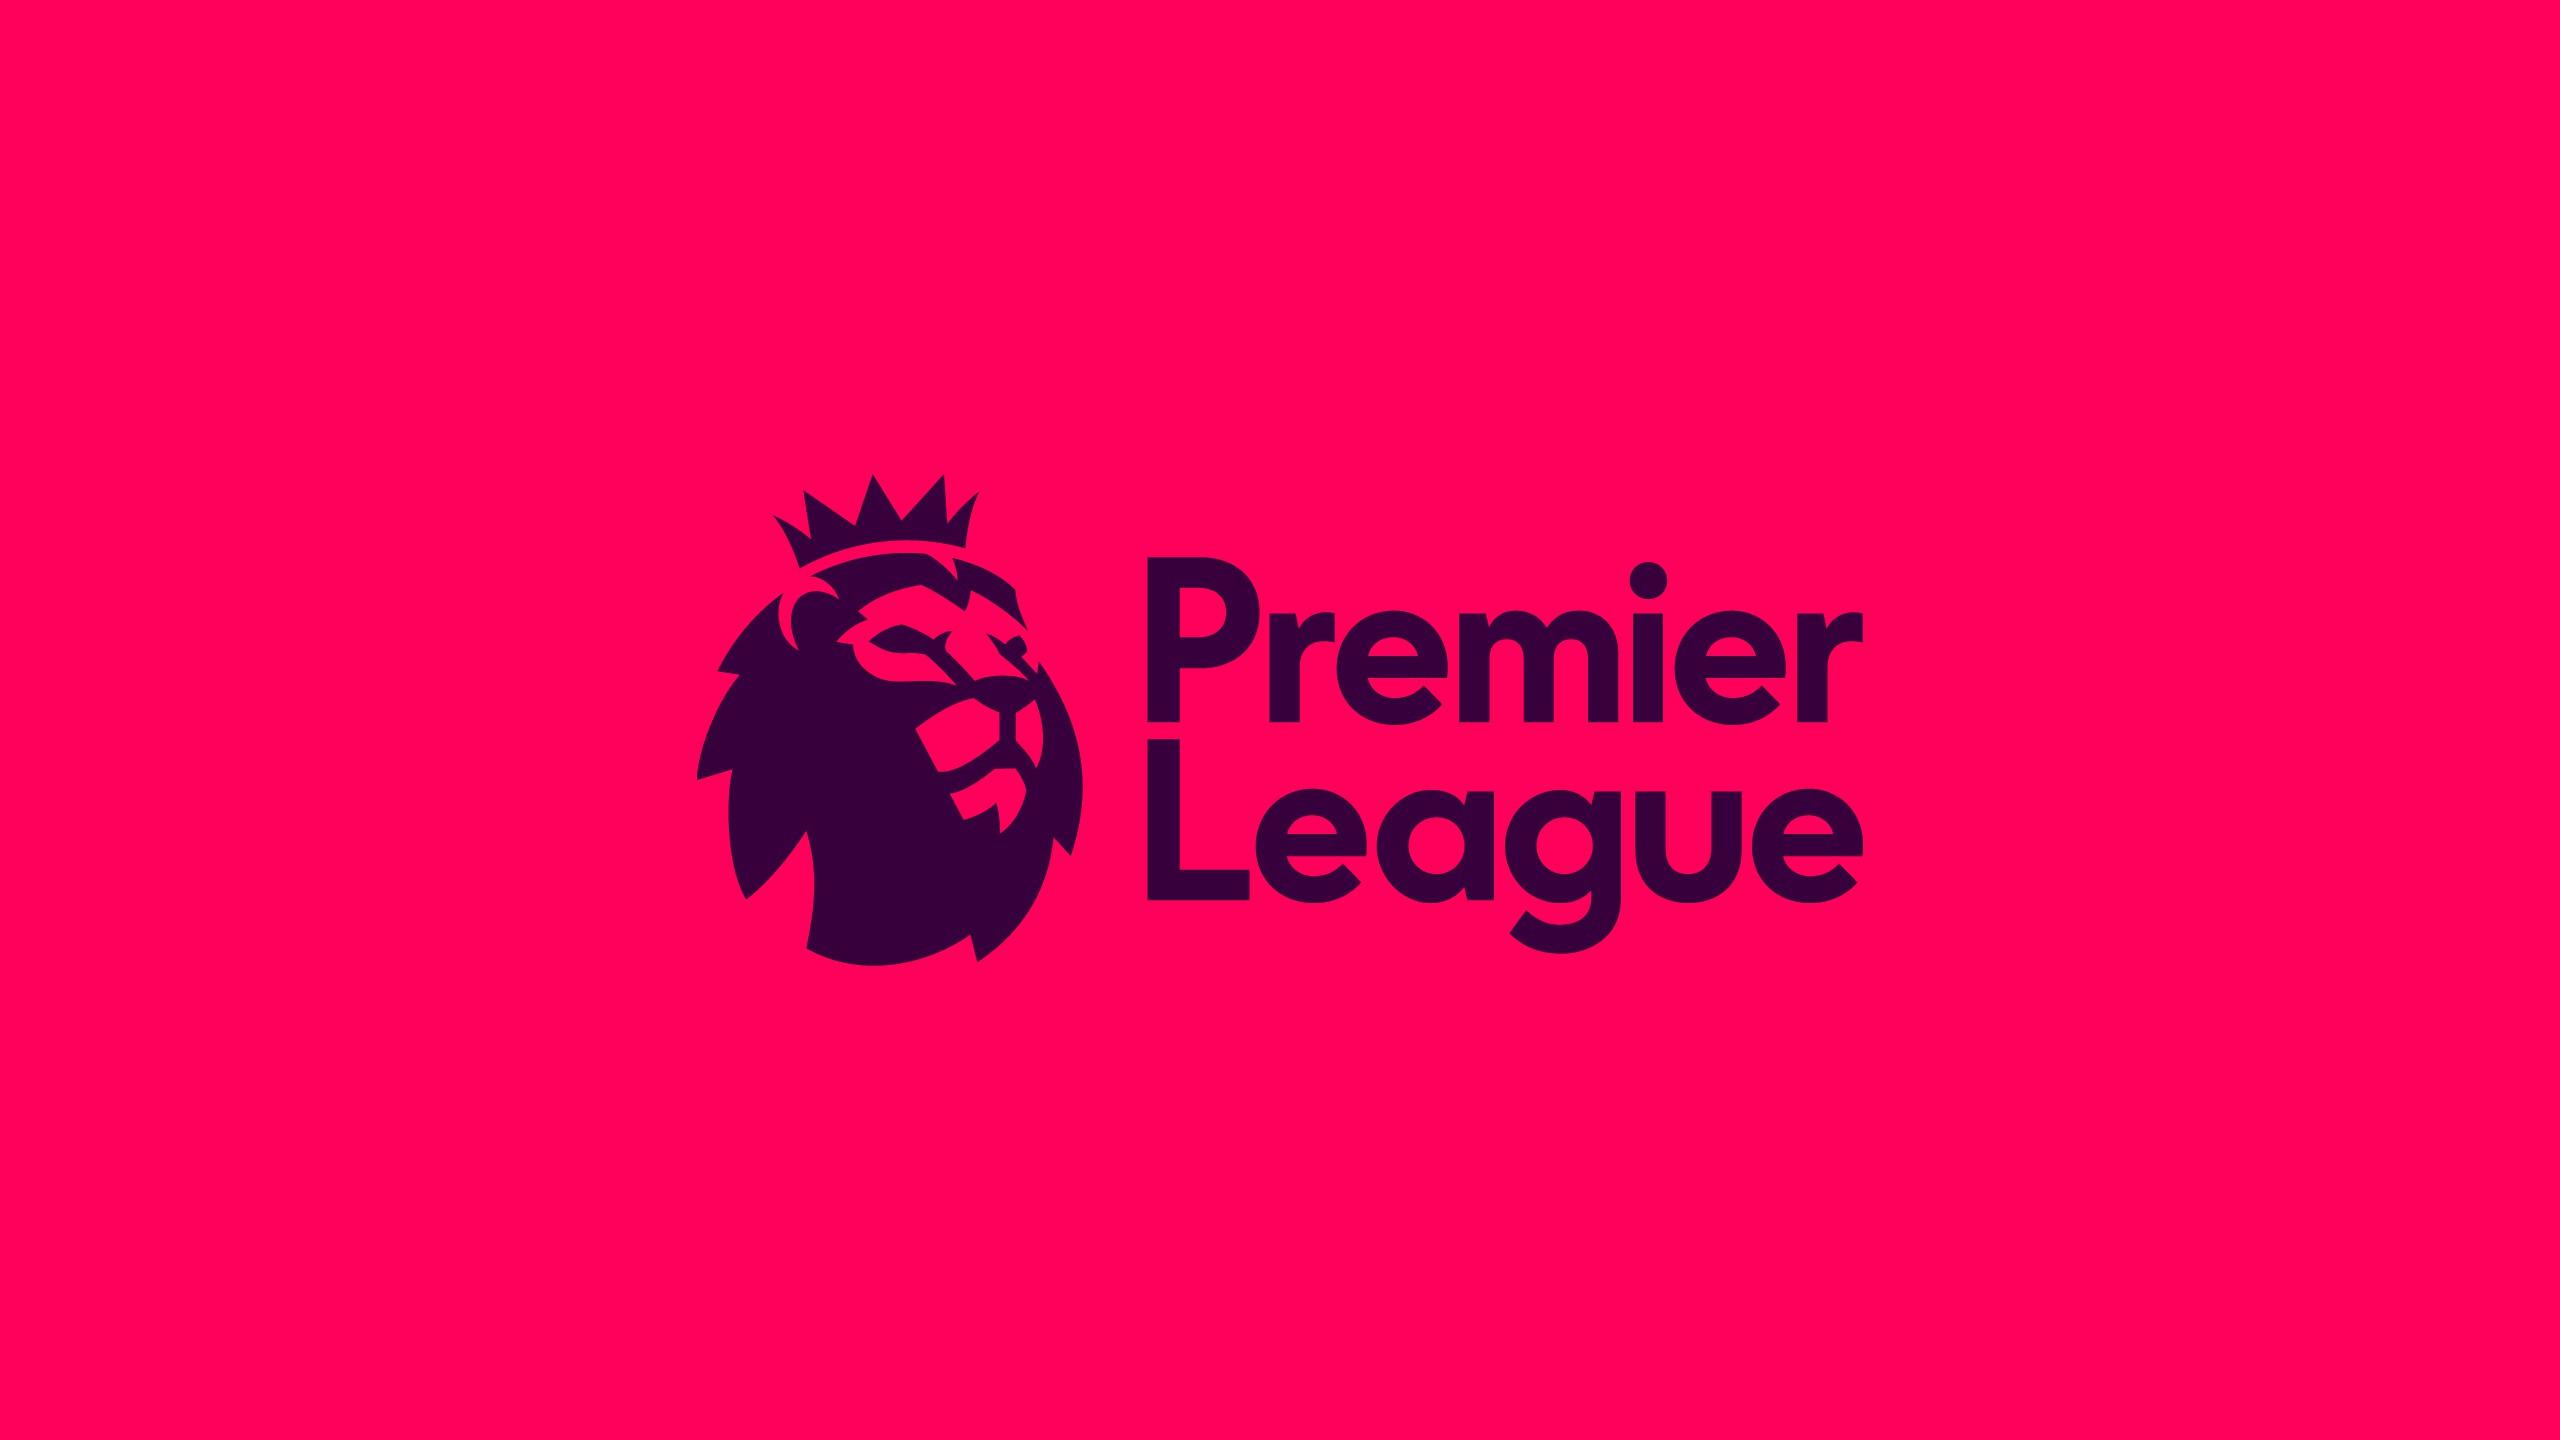 Ливерпуль, премьер-лига Англия, Манчестер Юнайтед, Манчестер Сити